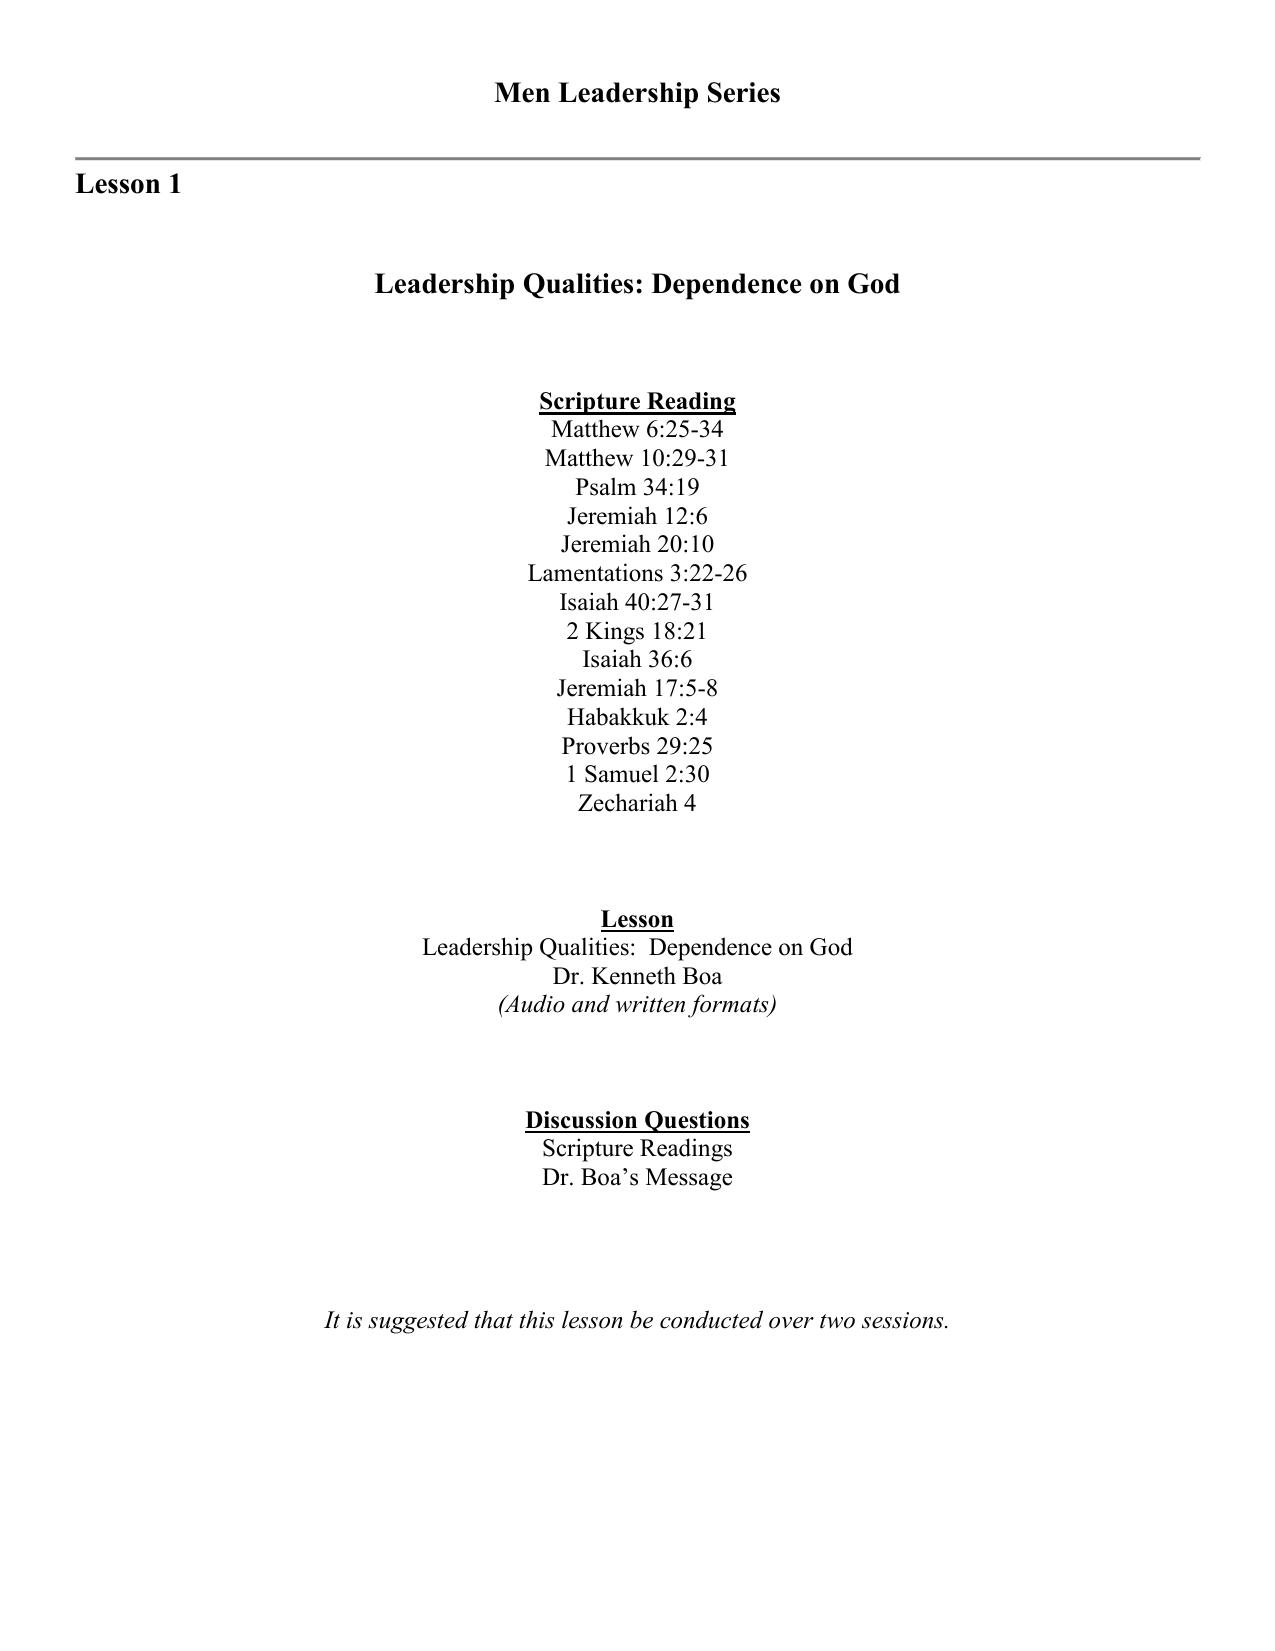 Men`s 7/52 Leadership Series - Kingdom Authority Ministries